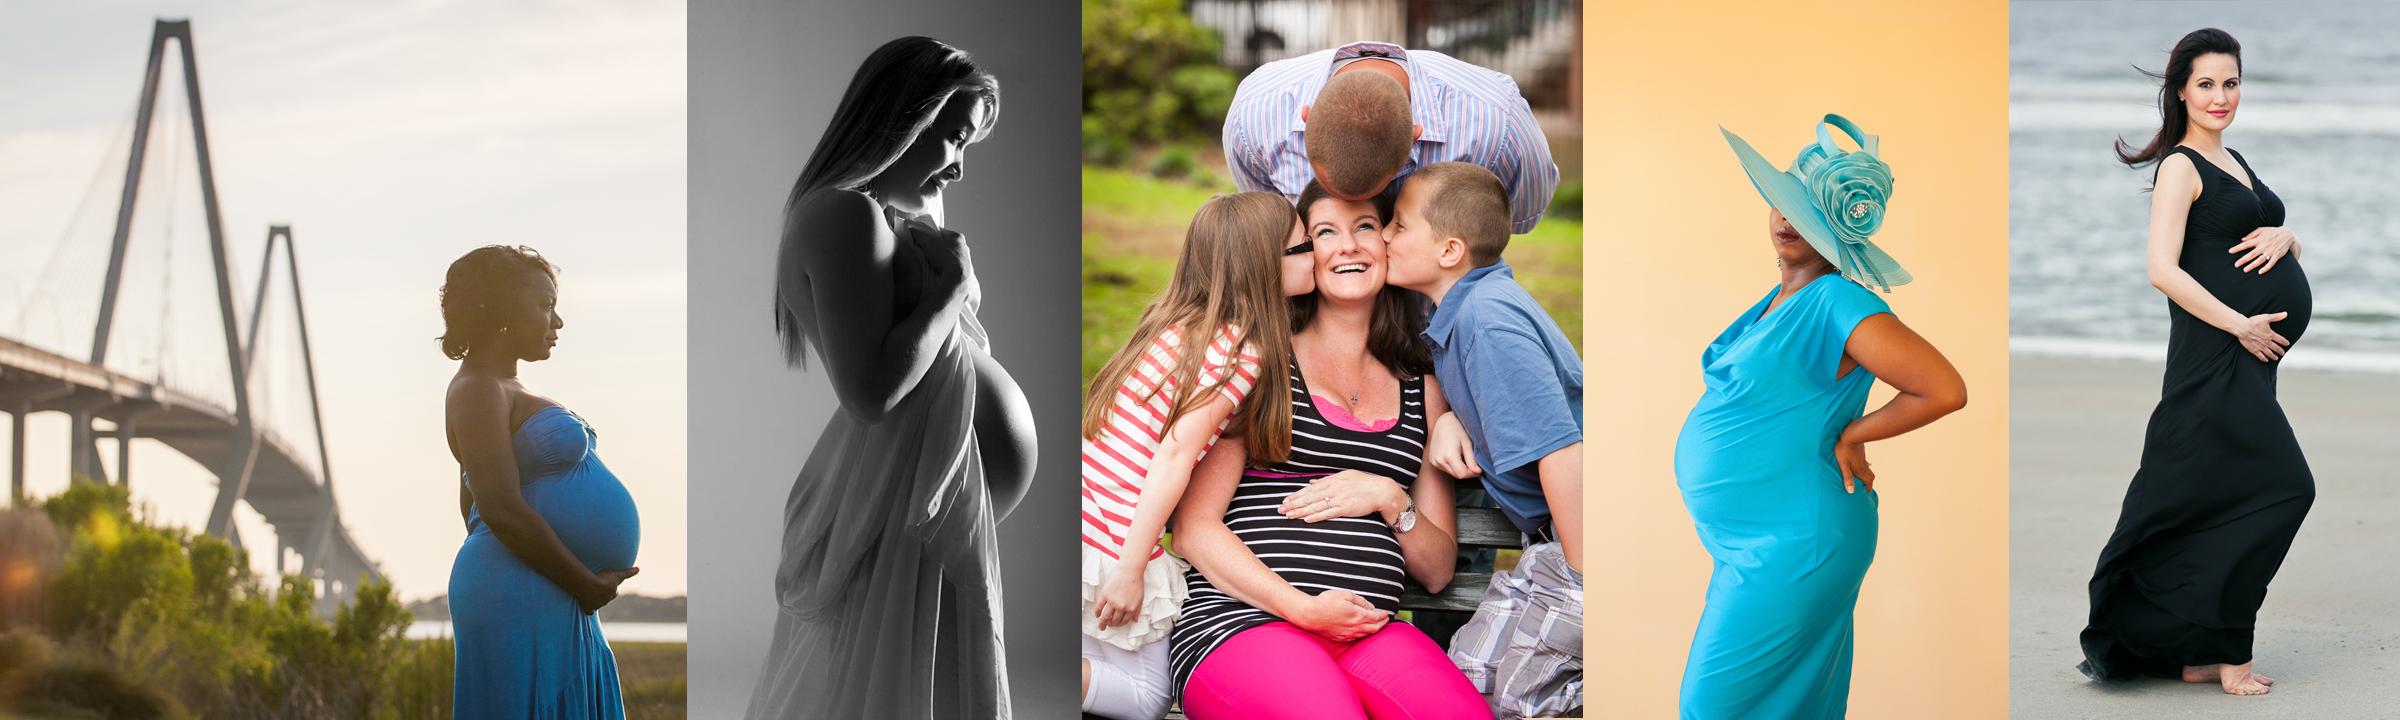 studio and on location maternity photoshoot